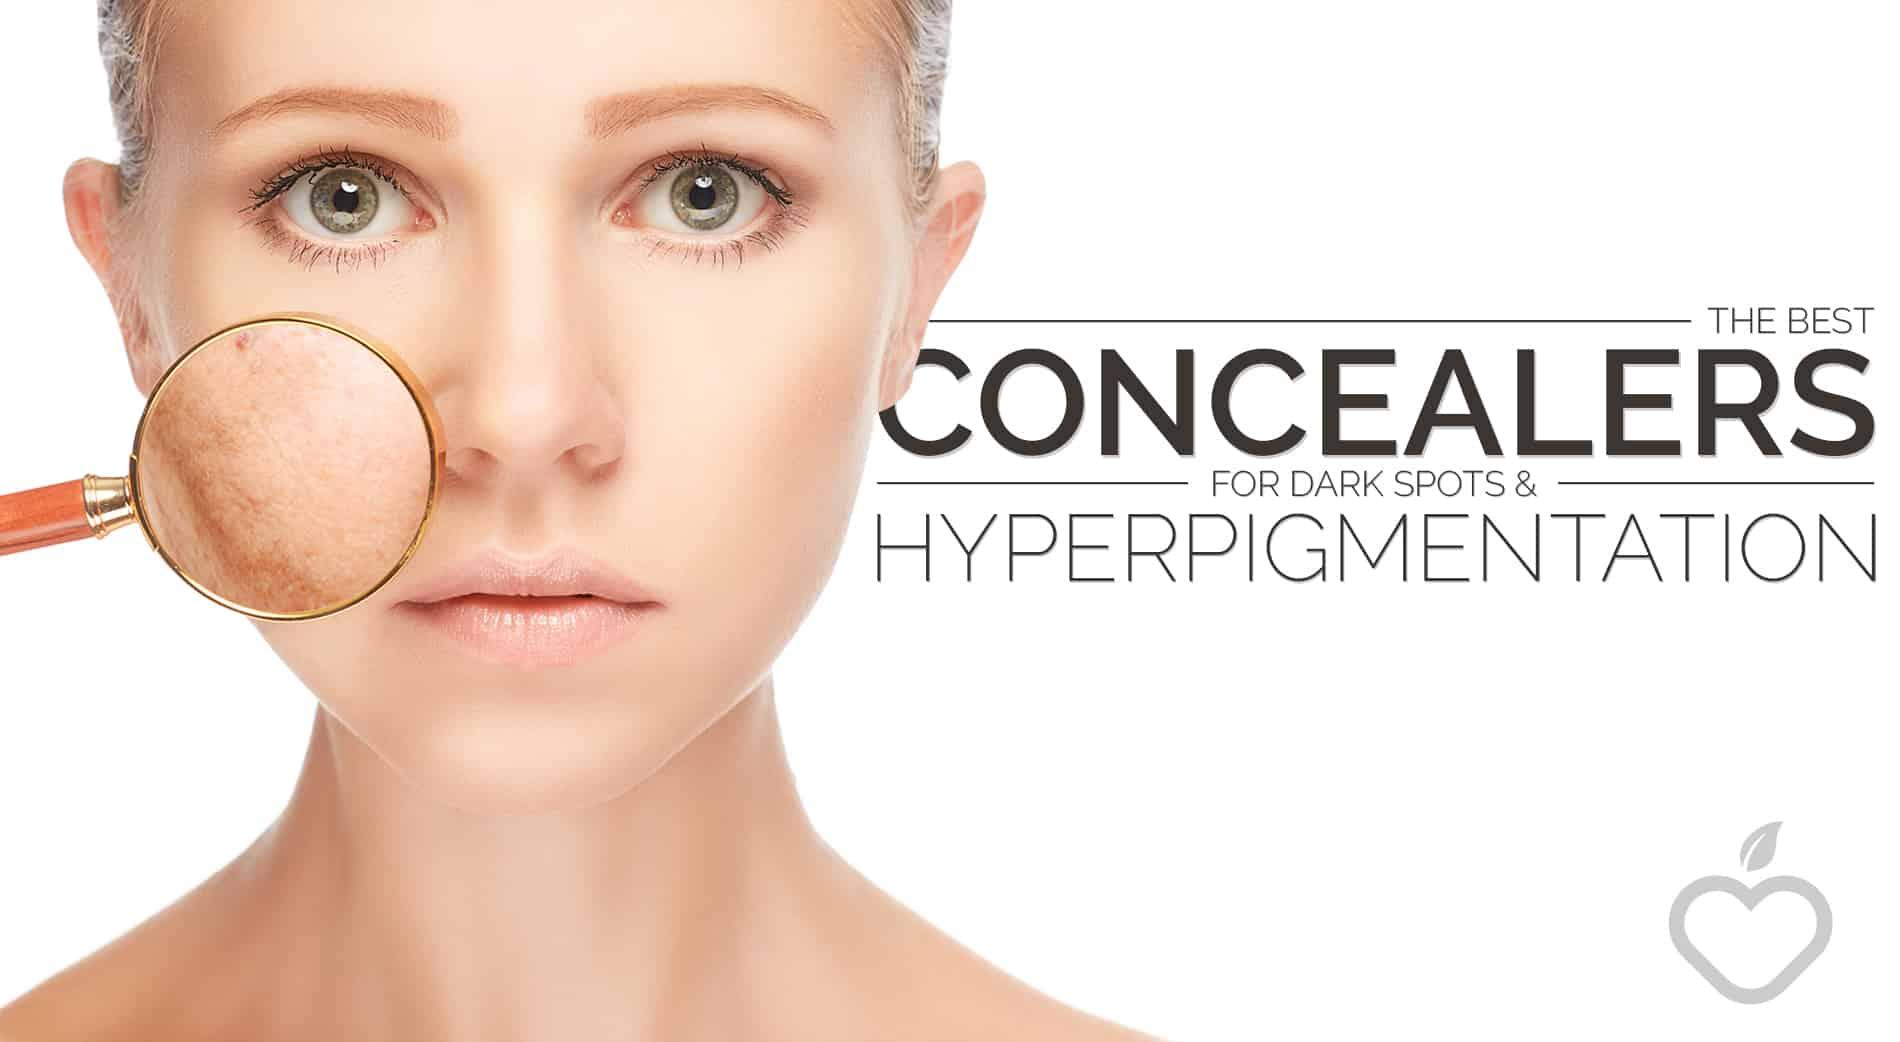 Concealers Image Design 1 - The Best Concealers For Dark Spots And Hyperpigmentation